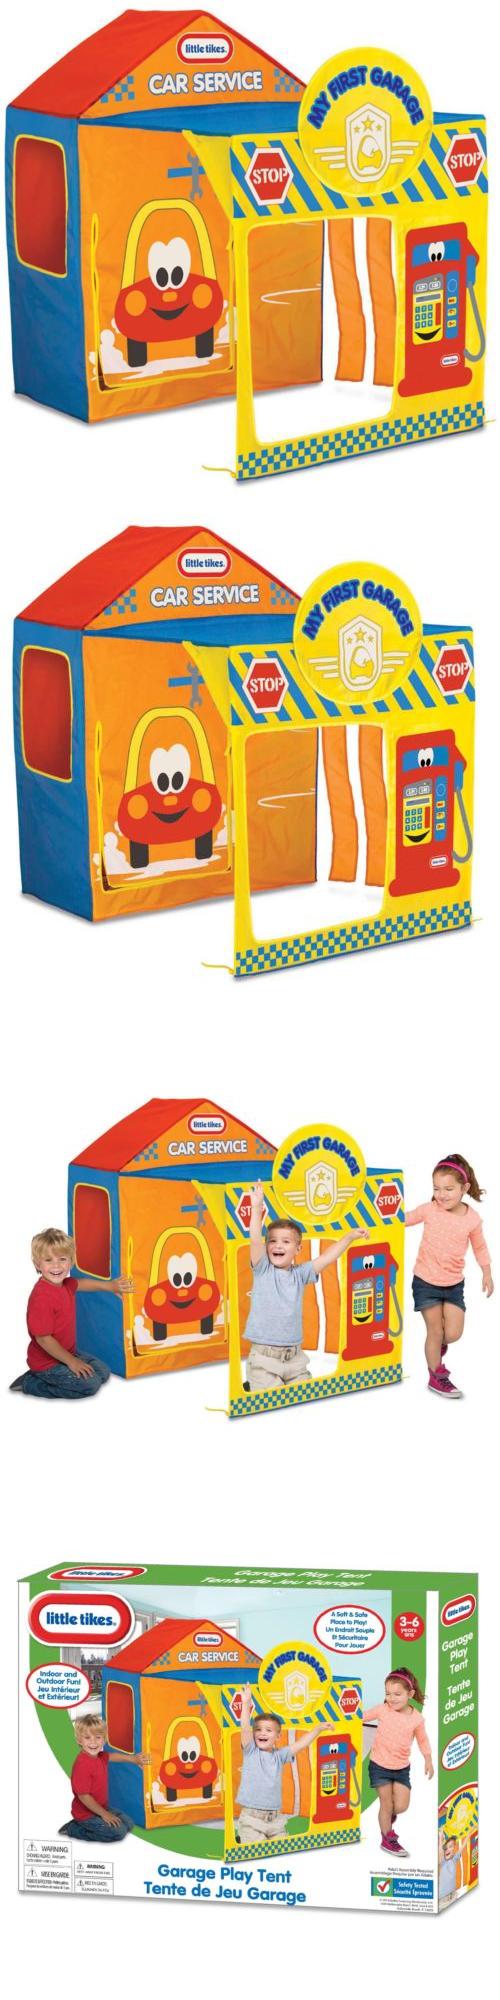 Child Size 2574 Little Tikes Garage Play Tent -u003e BUY IT NOW ONLY  sc 1 st  Pinterest & Child Size 2574: Little Tikes Garage Play Tent -u003e BUY IT NOW ONLY ...